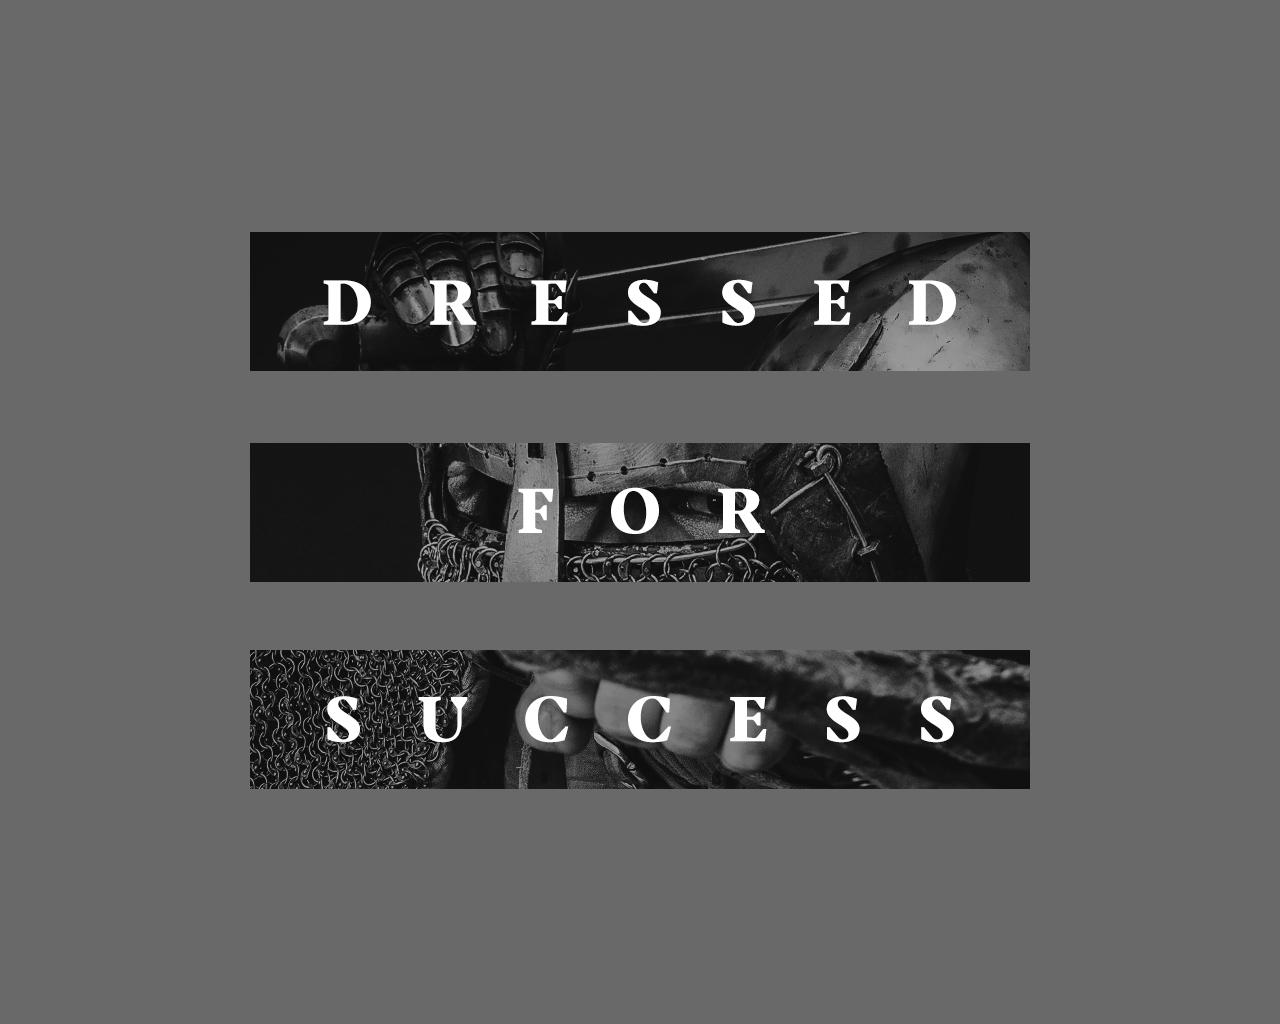 DressedForSuccess.jpg